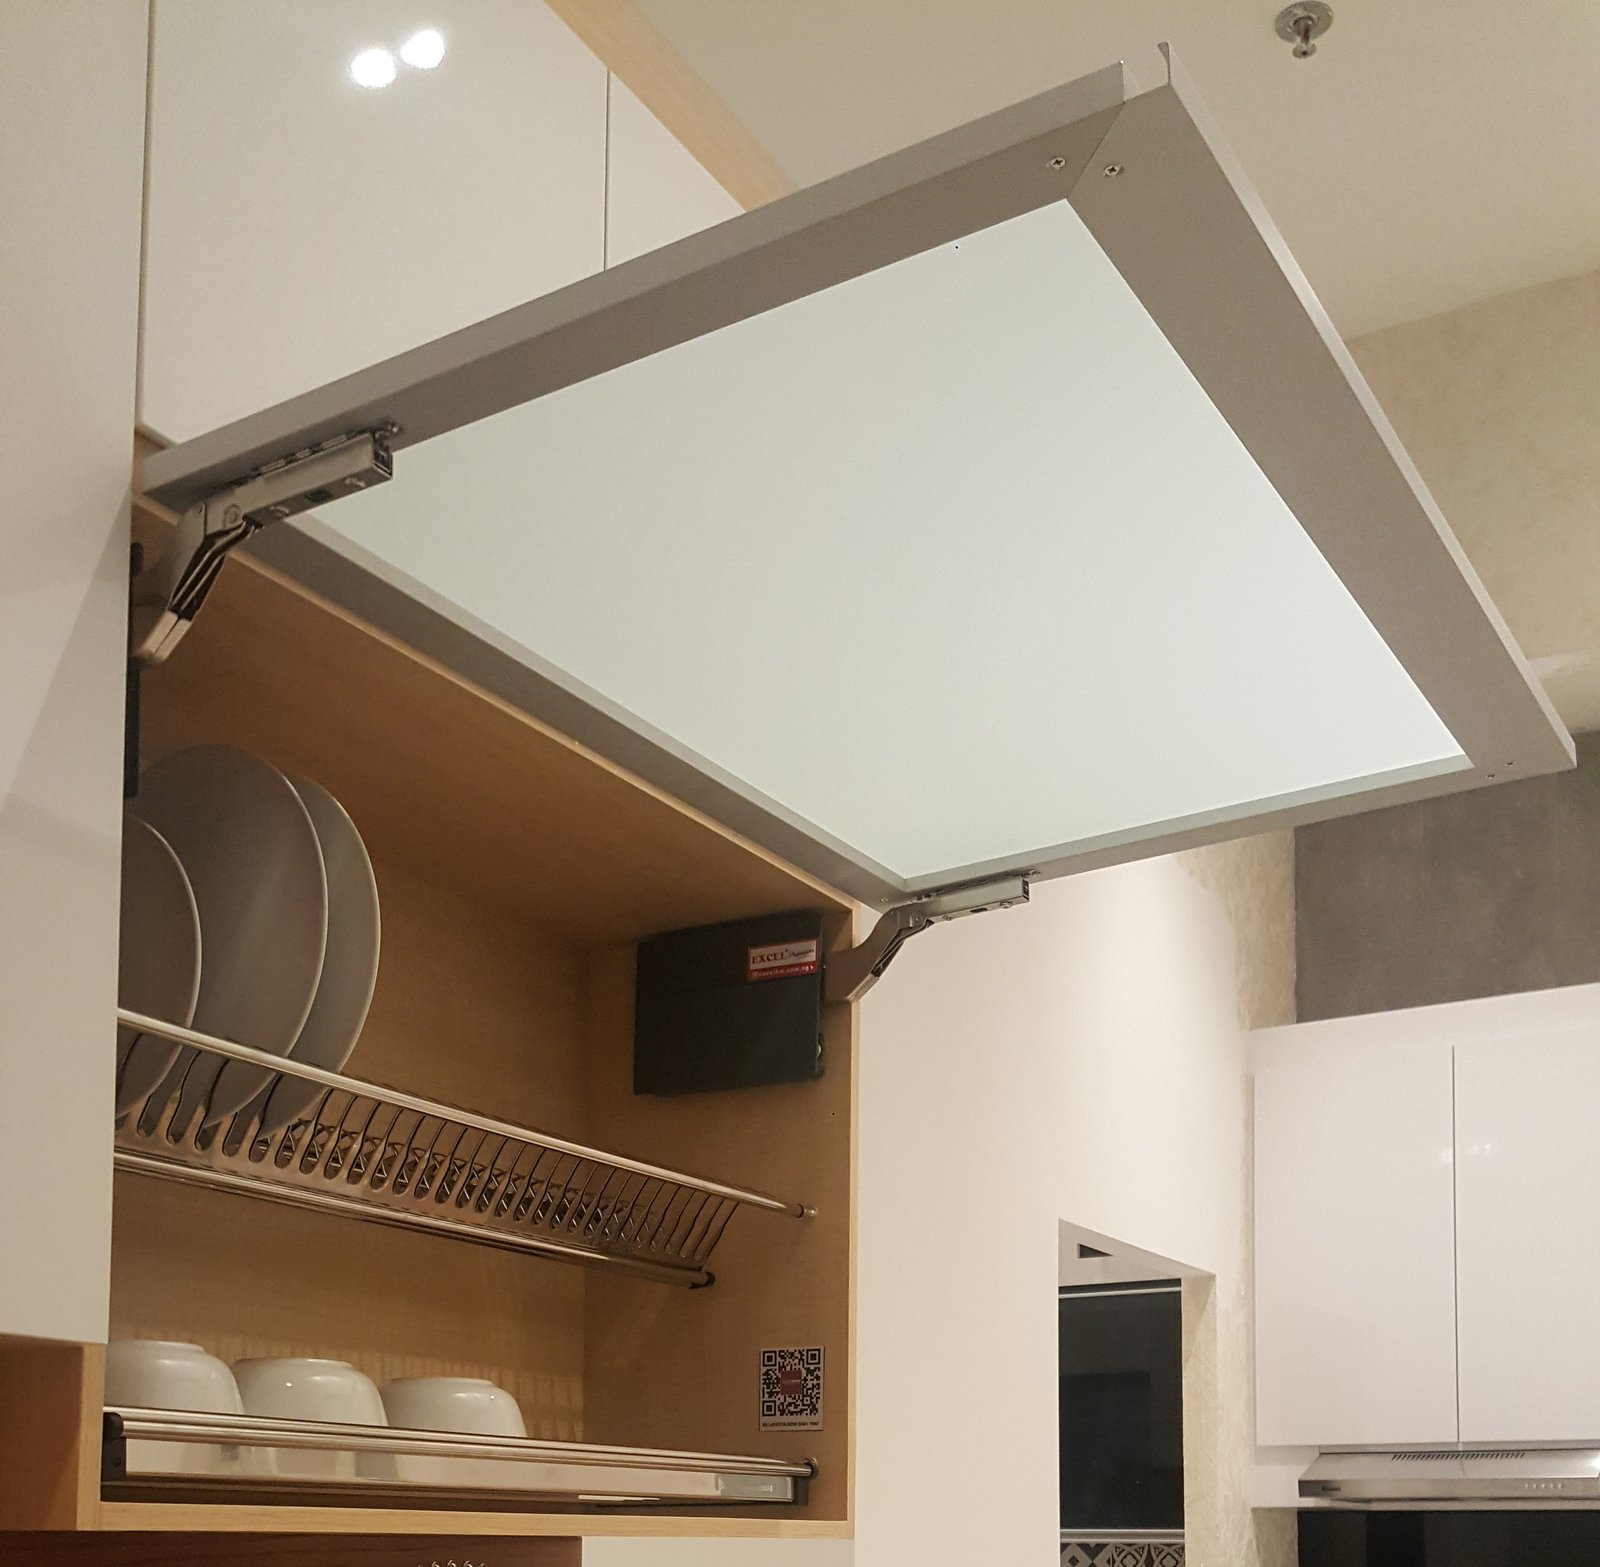 rak dengan bentuk lemari pada desain dapur minimalis